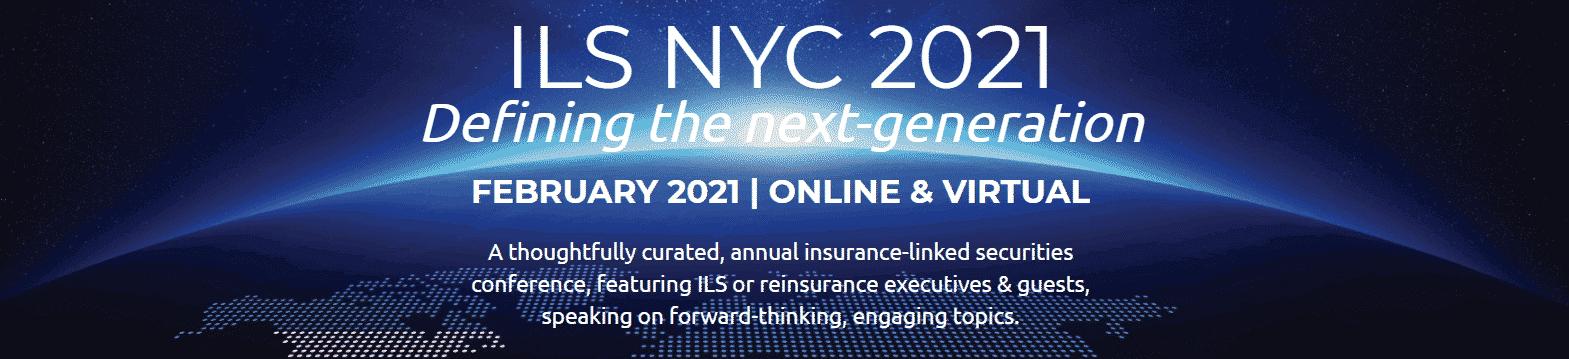 ILS NYC 2021 - DAY 1